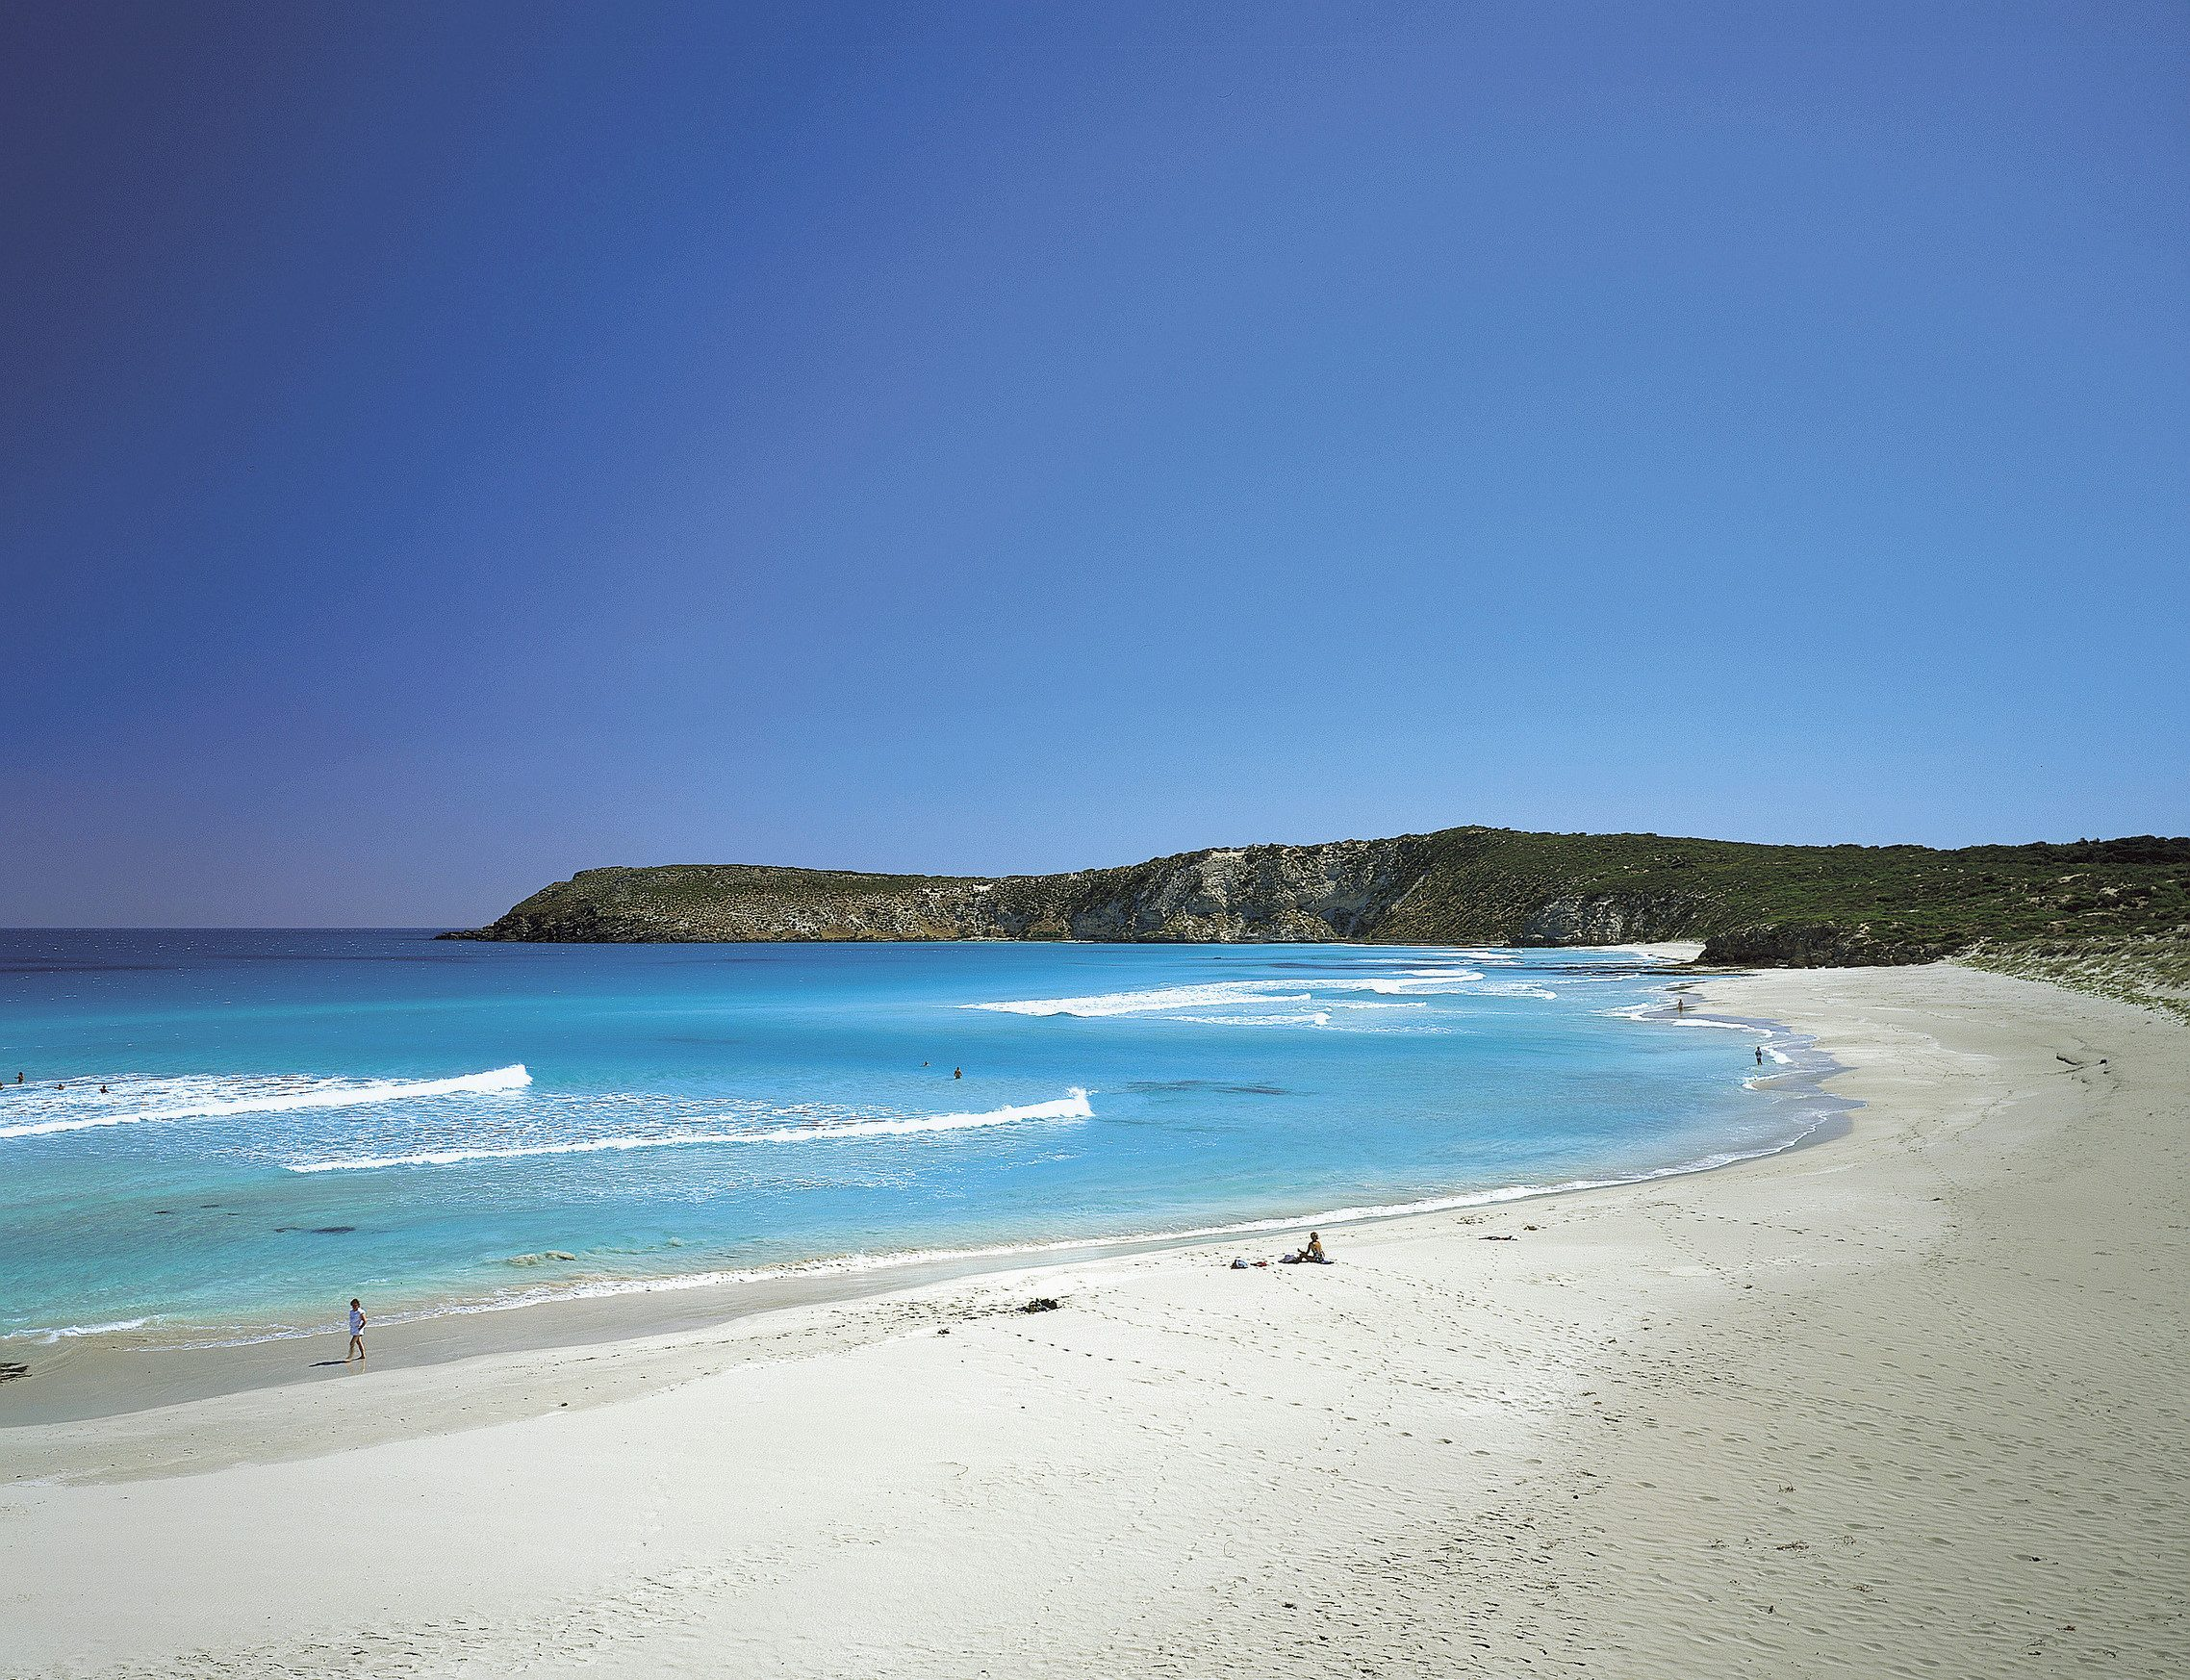 South Australia, Kangaroo Island, Pennington Bay